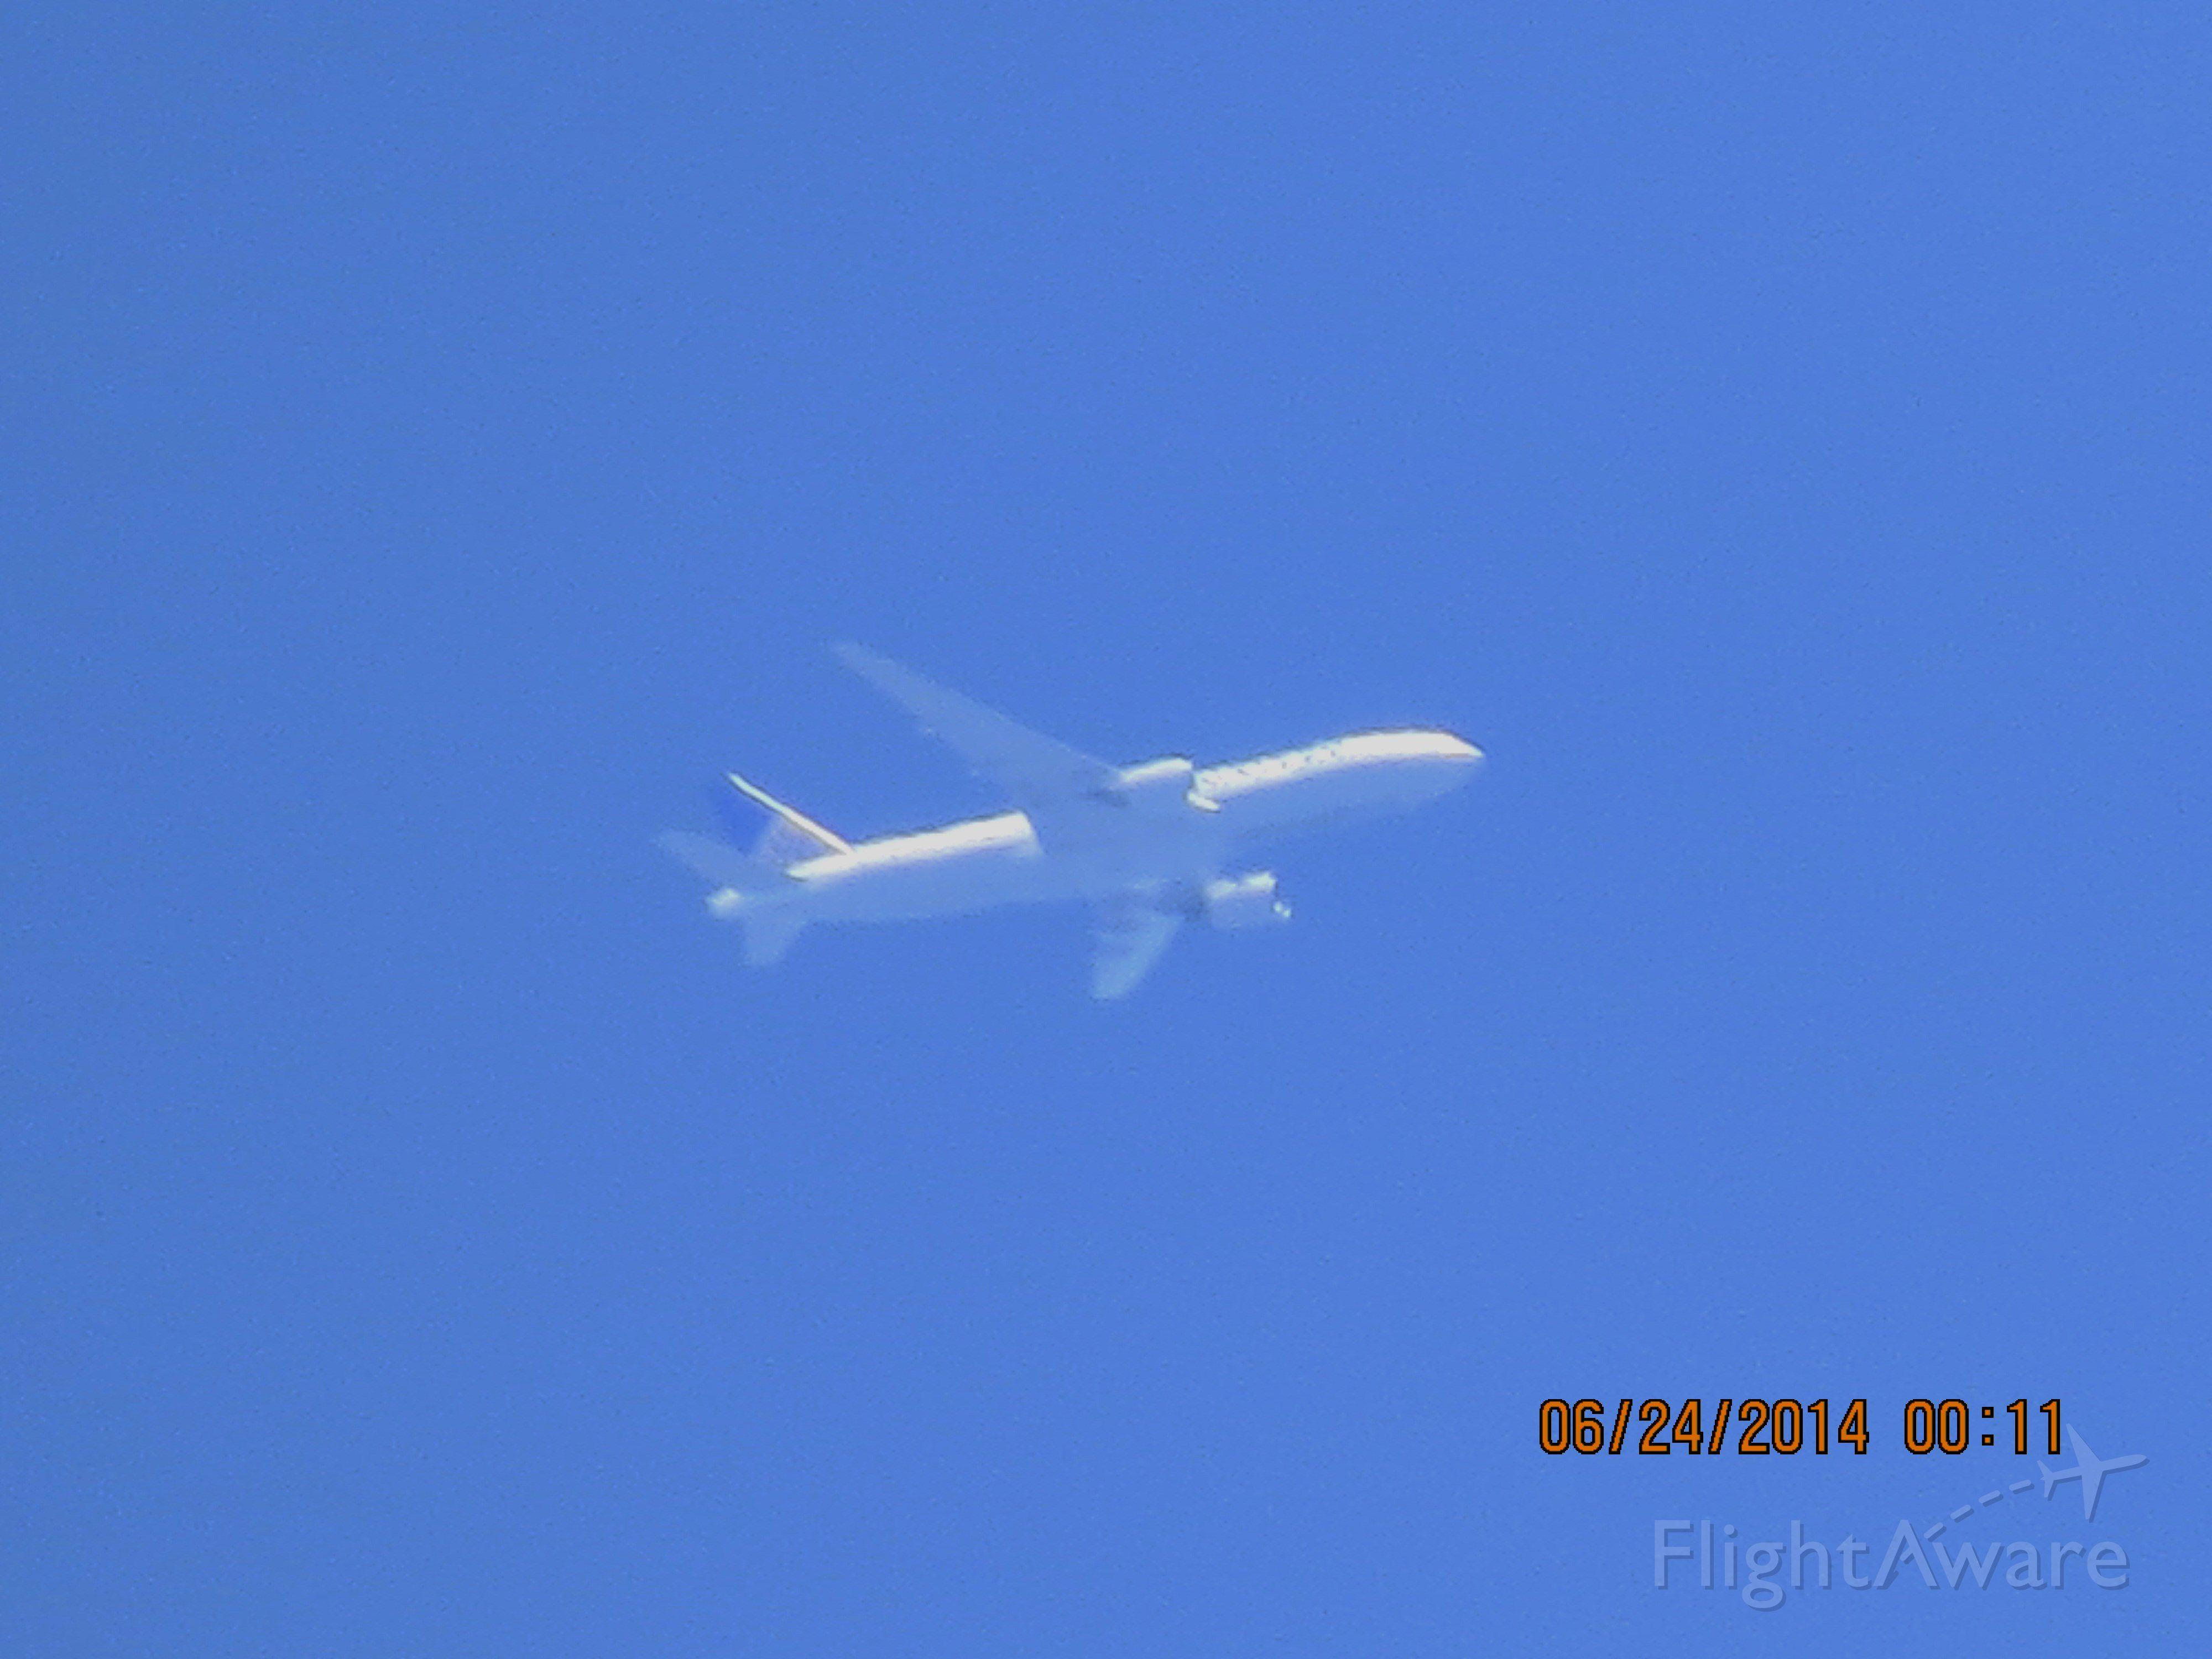 BOEING 777-200LR (N796UA) - United flight 326 from LAX to IAD over Baxter Springs Ks at 34,975 feet.